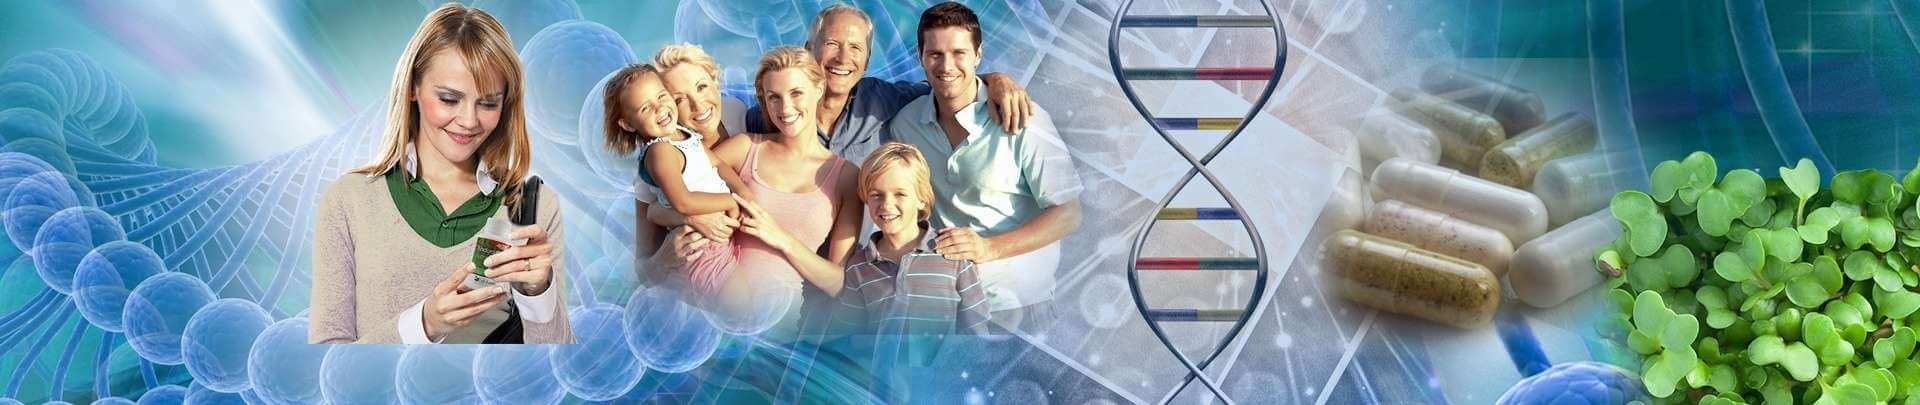 Nutragenomics – The Next Generation Nutraceuticals